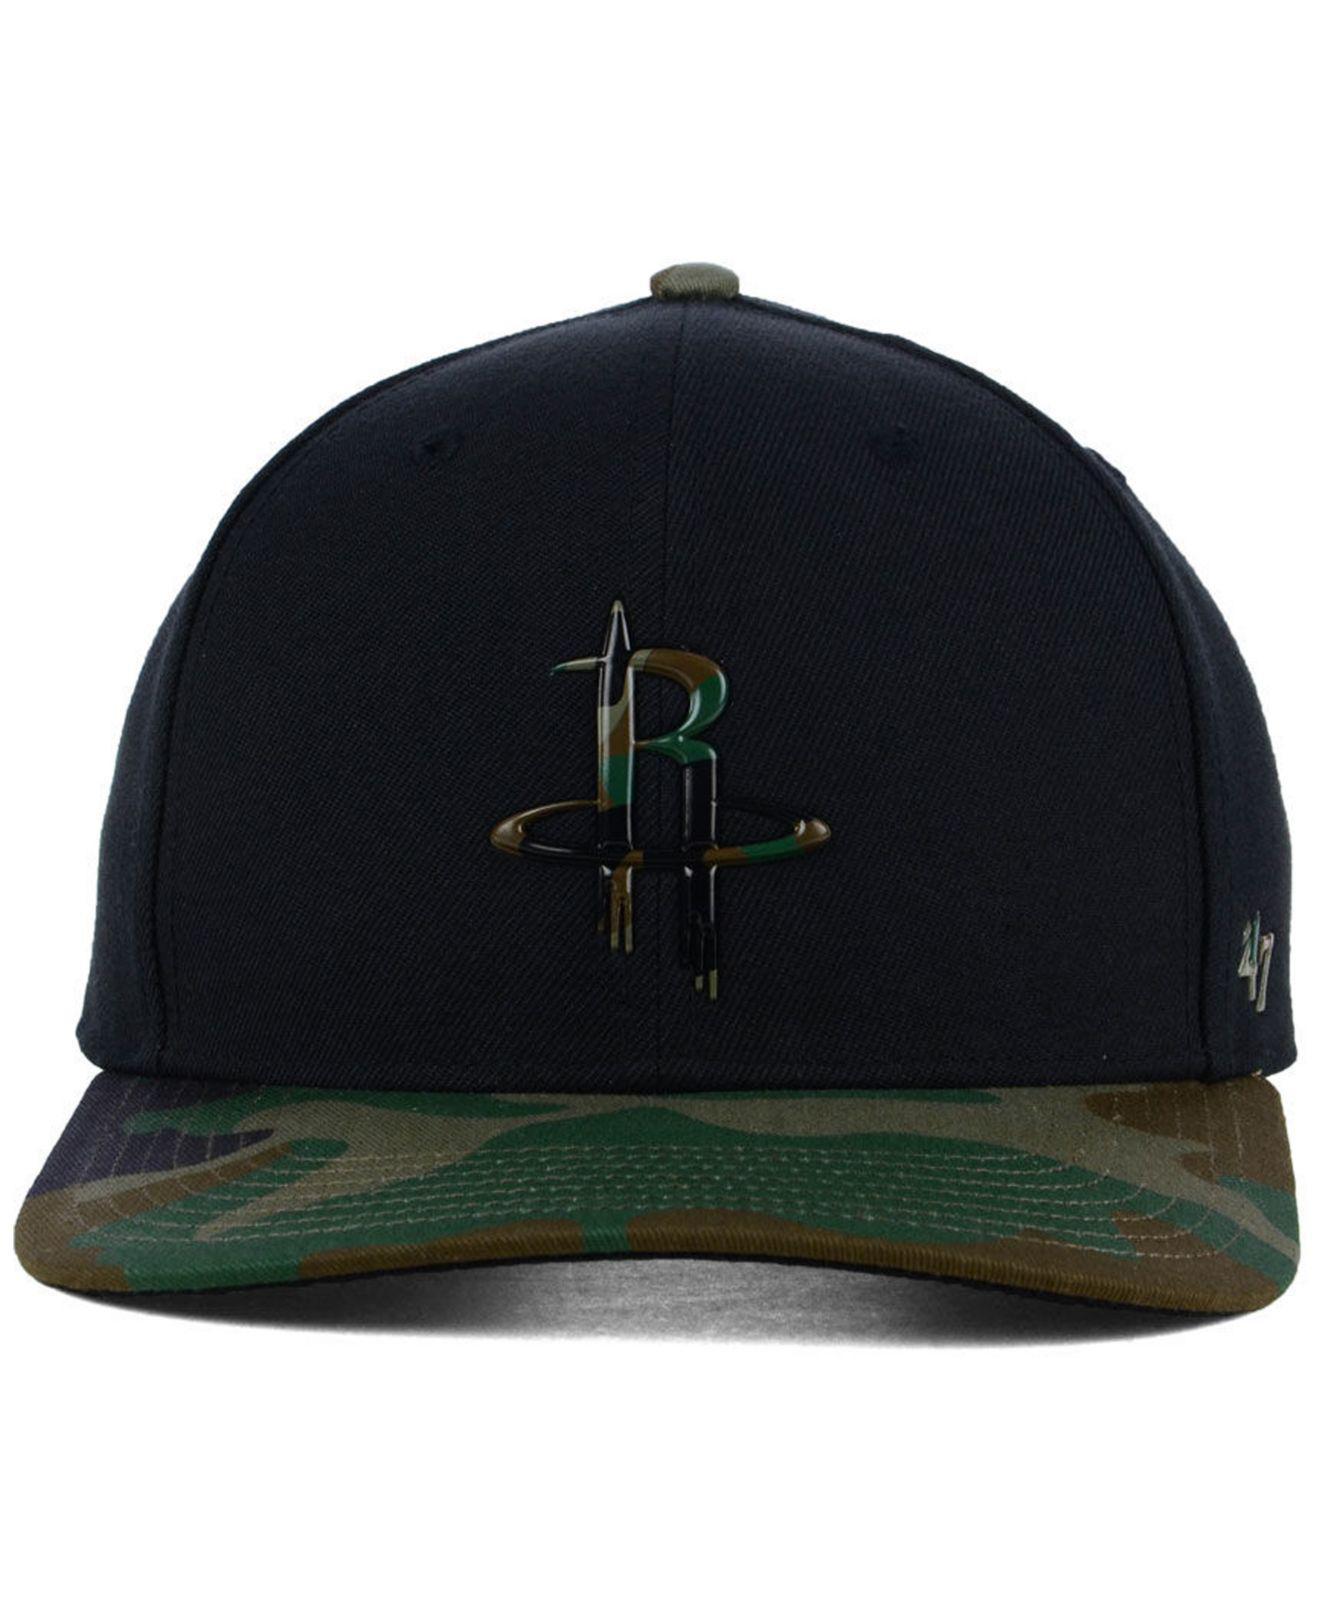 buy online 2d96a 37d1a ... real lyst 47 brand houston rockets caster camo mvp cap in black for men  5f43b 31b2d